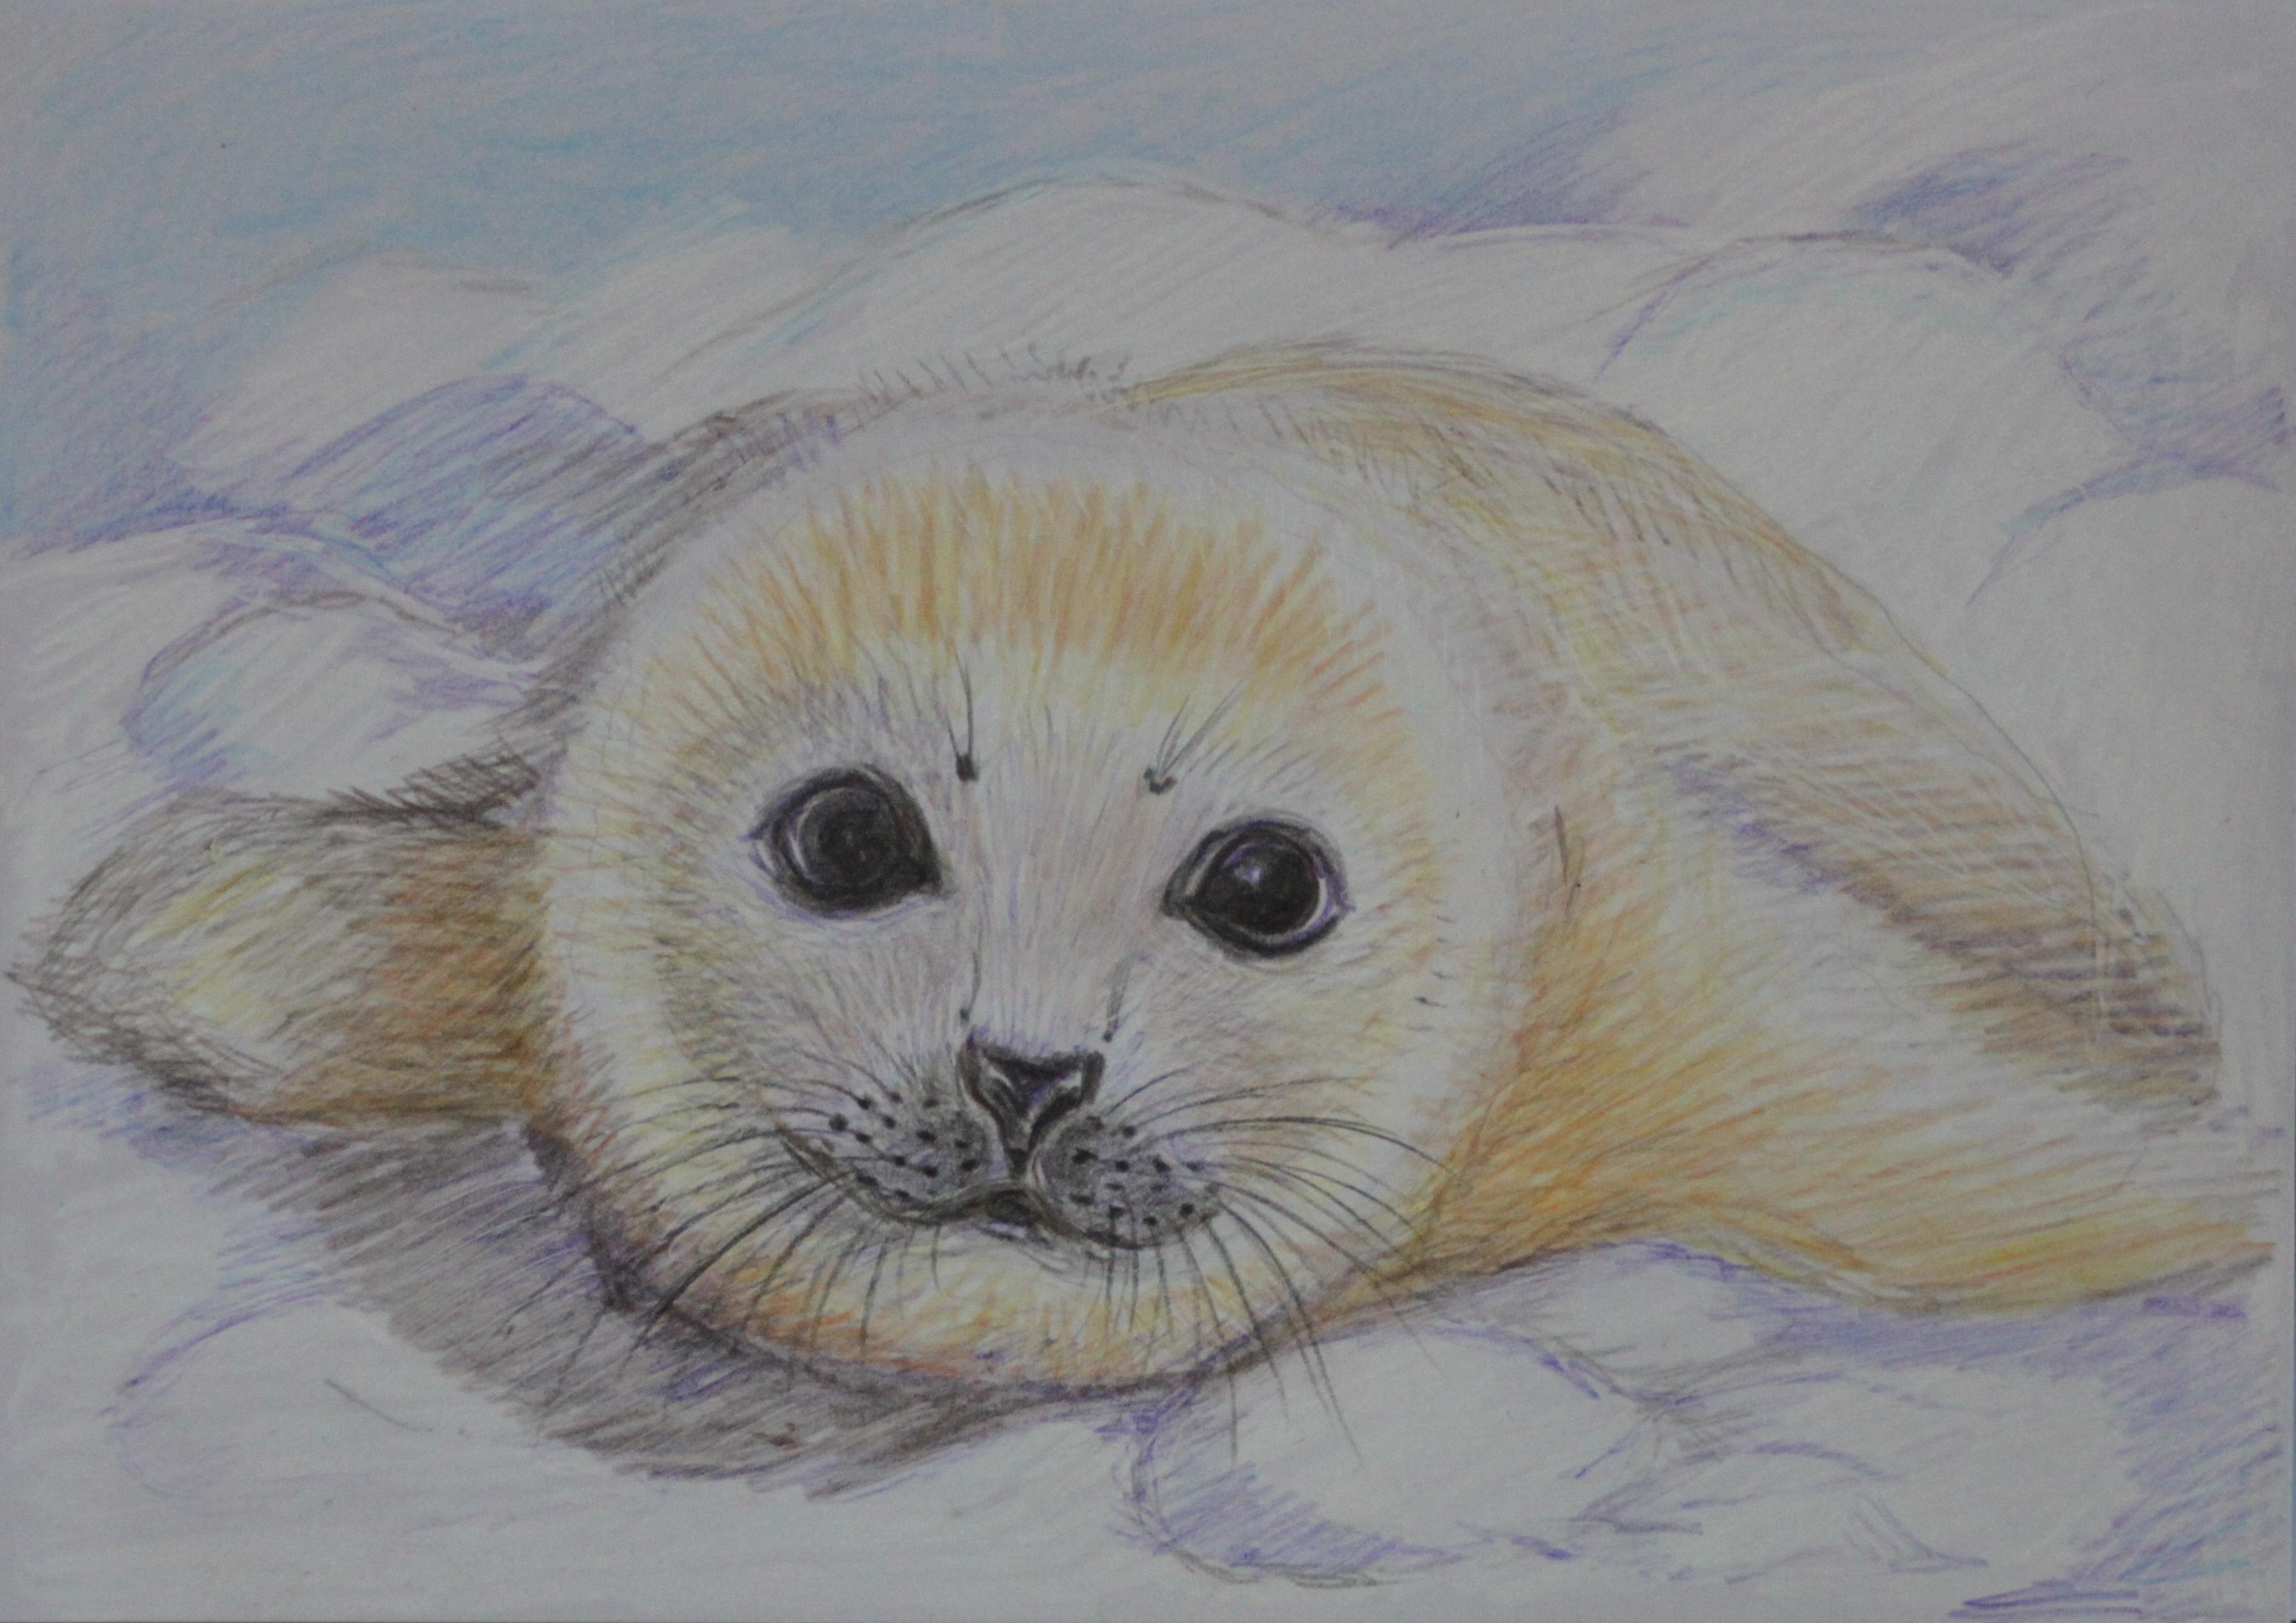 3384 || 1612 || Harp seal pup || £20.00 || 2645